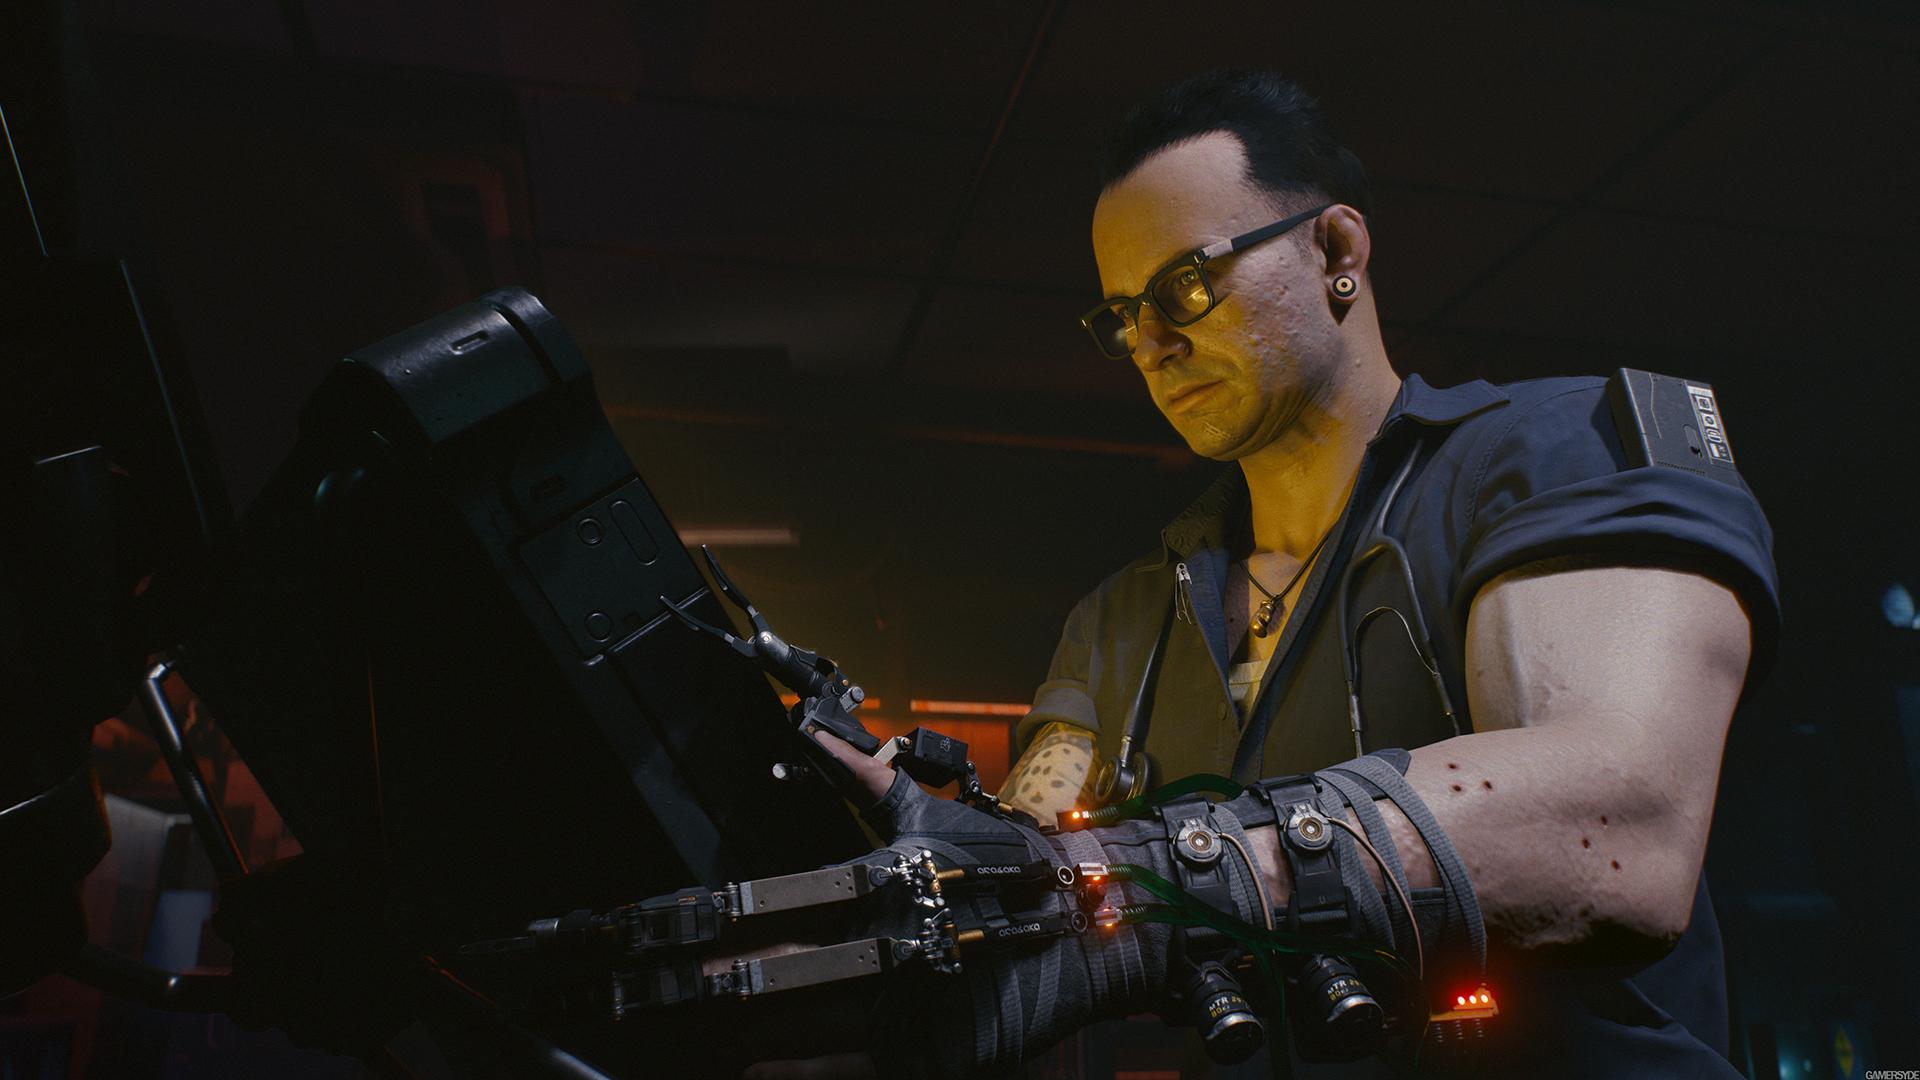 cyberpunk 2077 - e3 2018 - img22